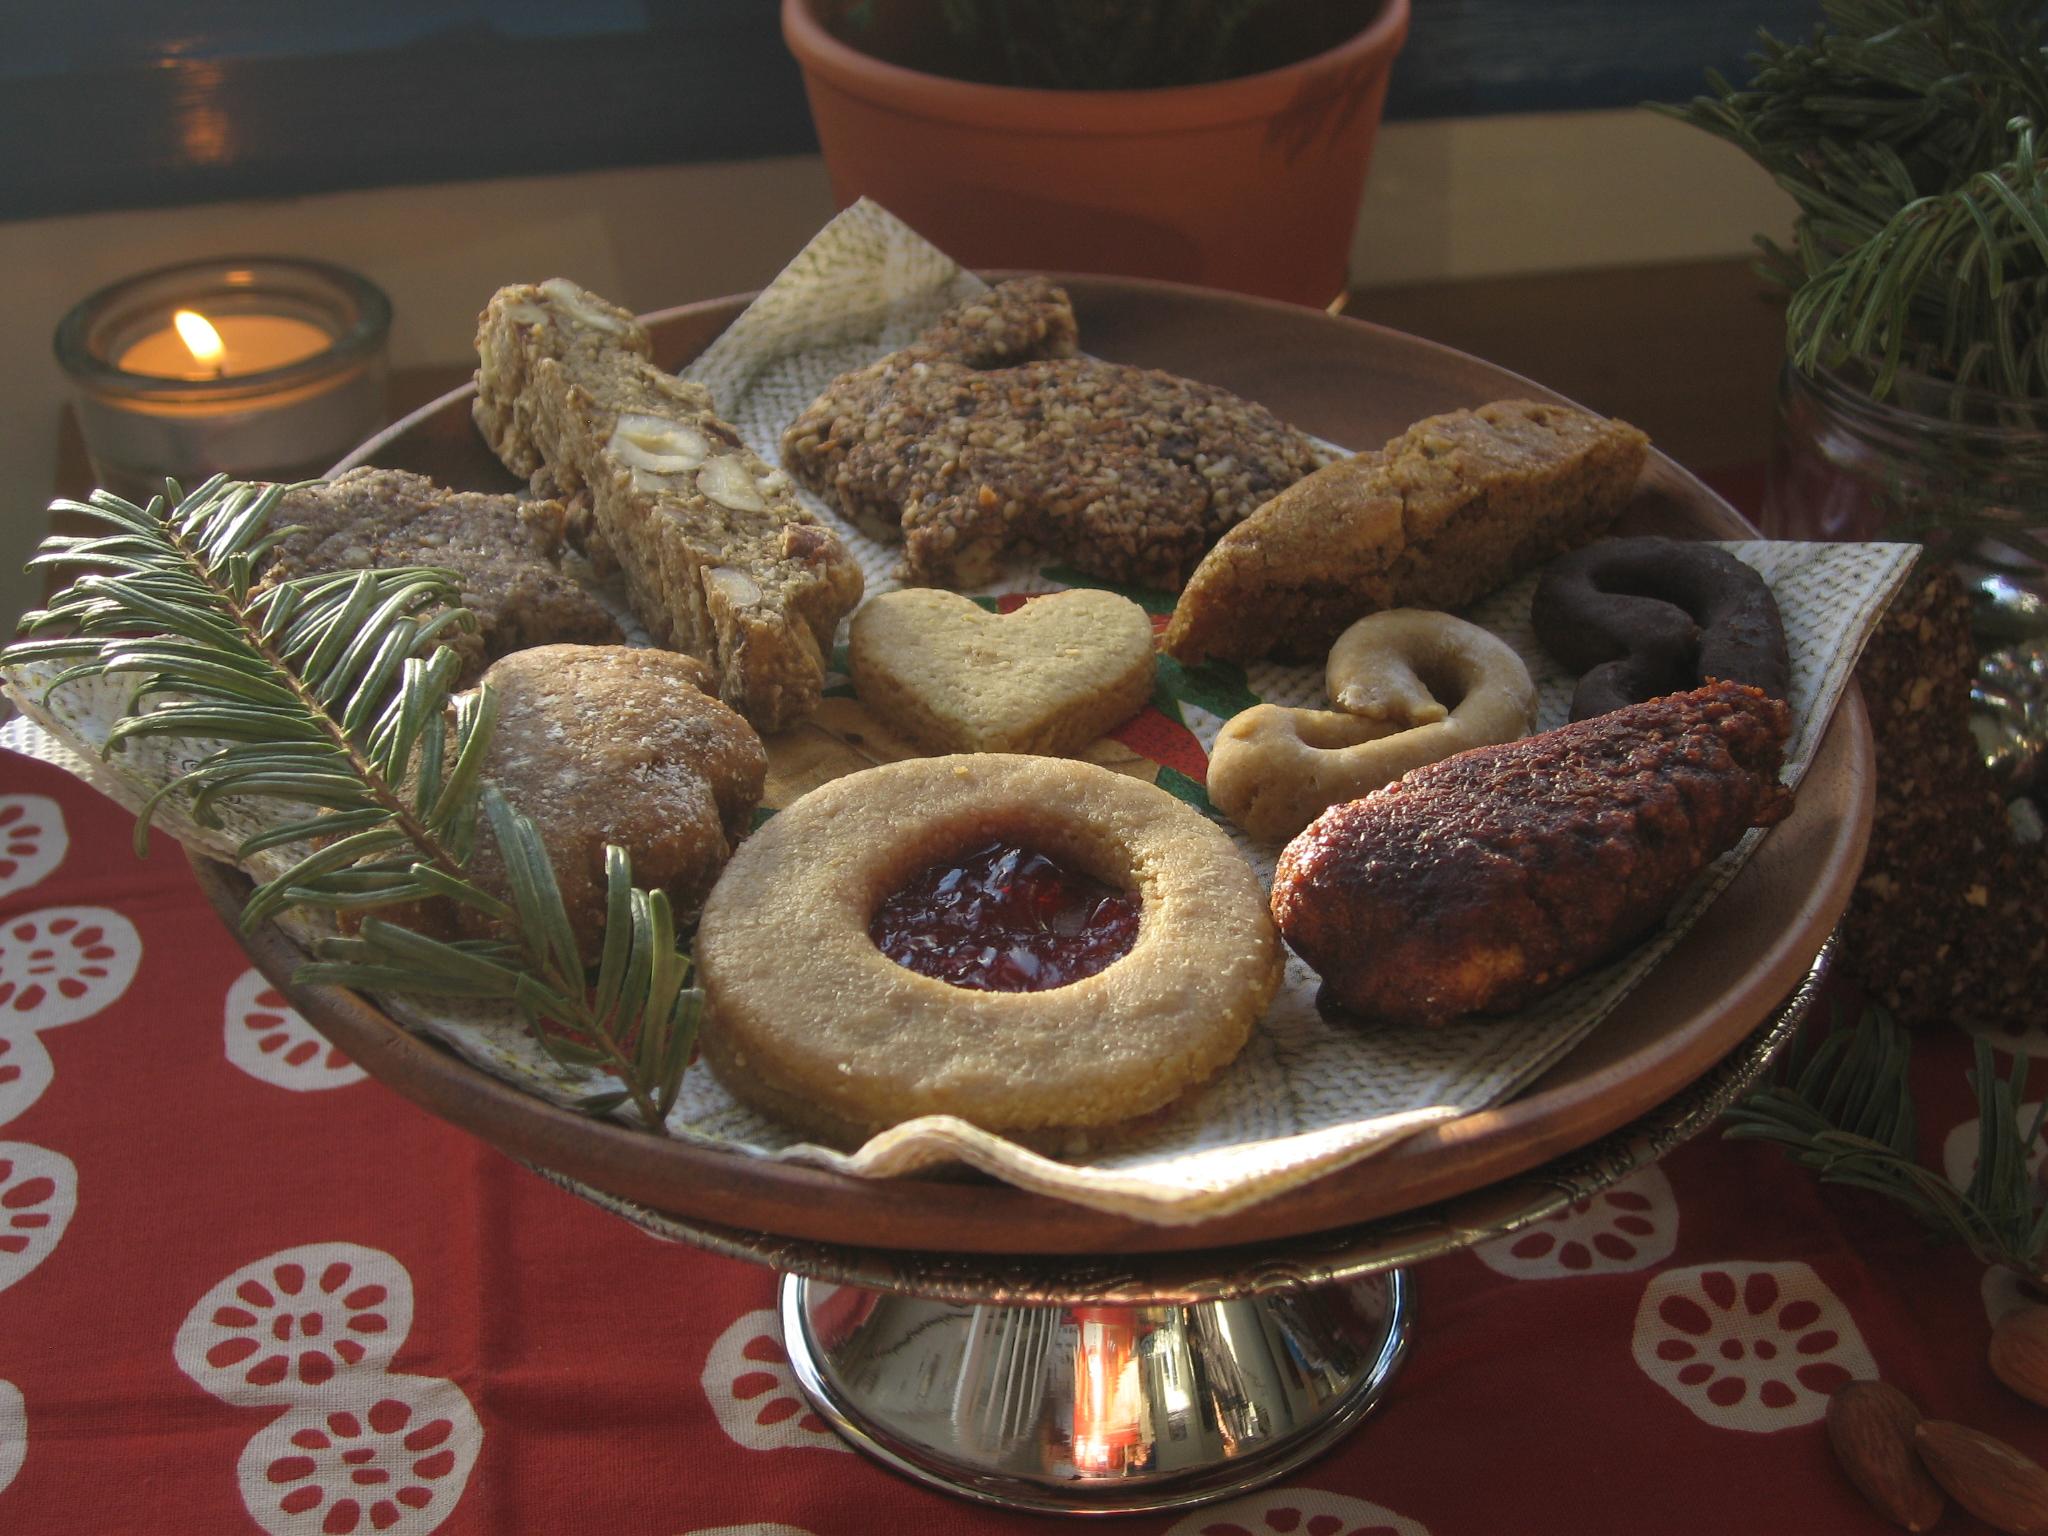 Last year's Christmas baking extravaganza.